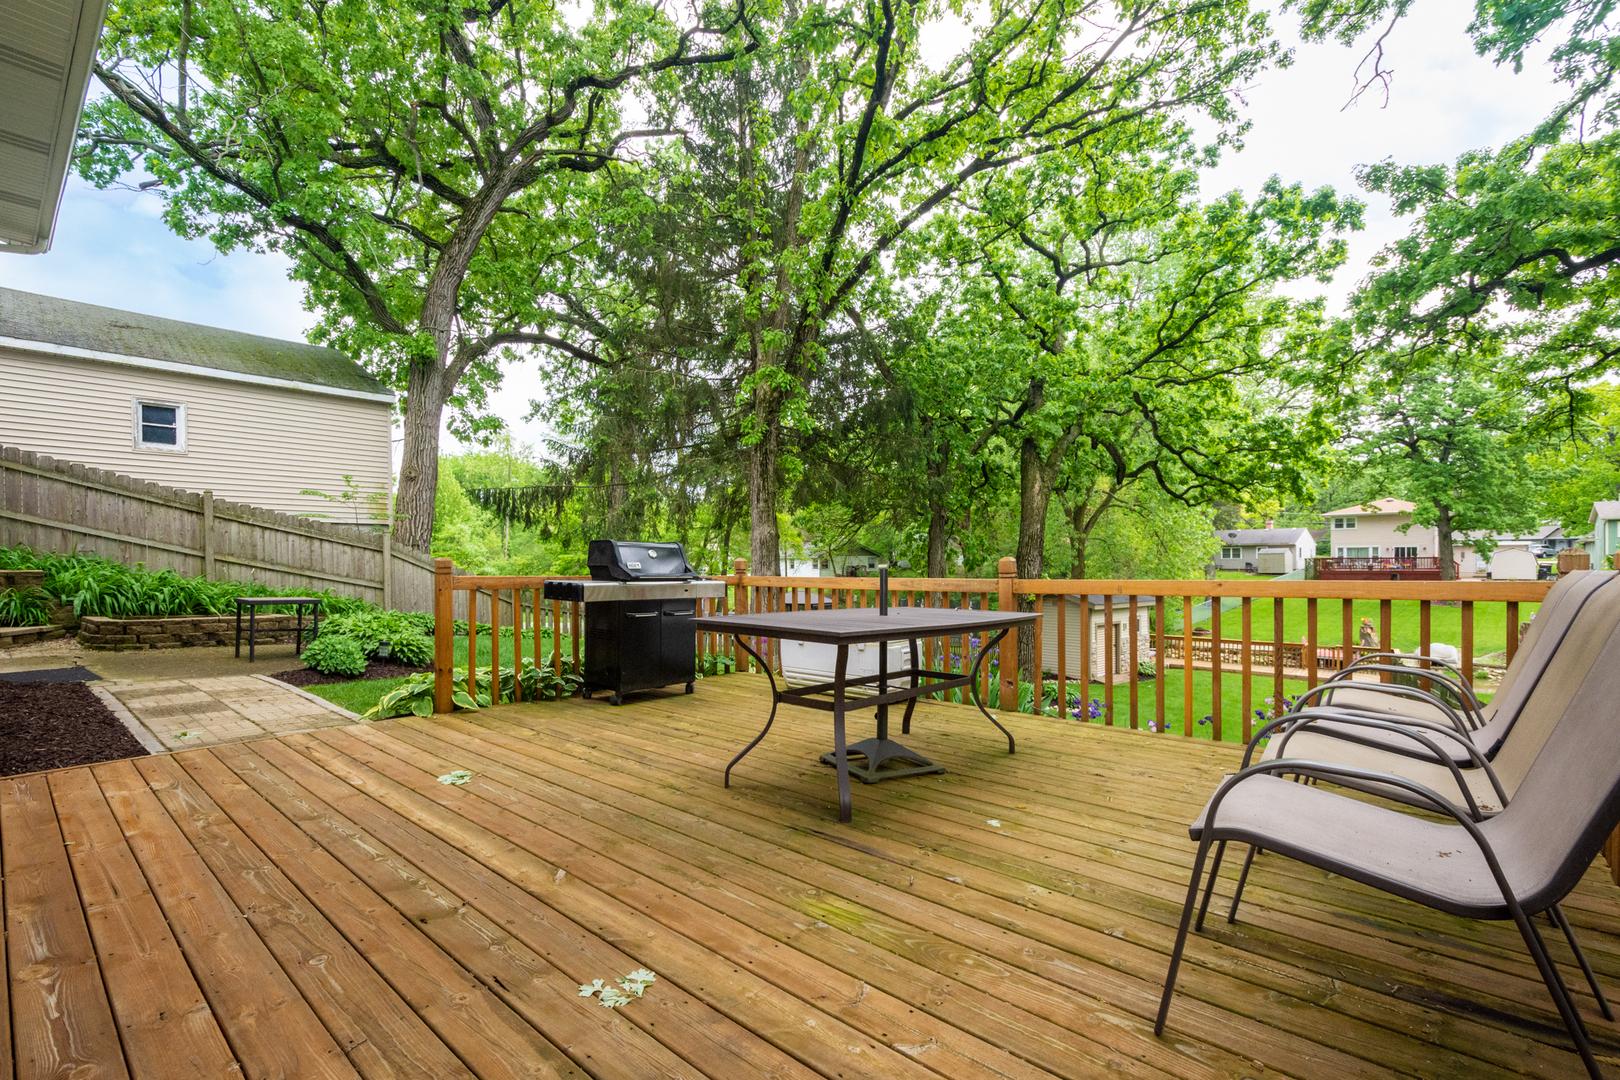 136 Timber, ANTIOCH, Illinois, 60002